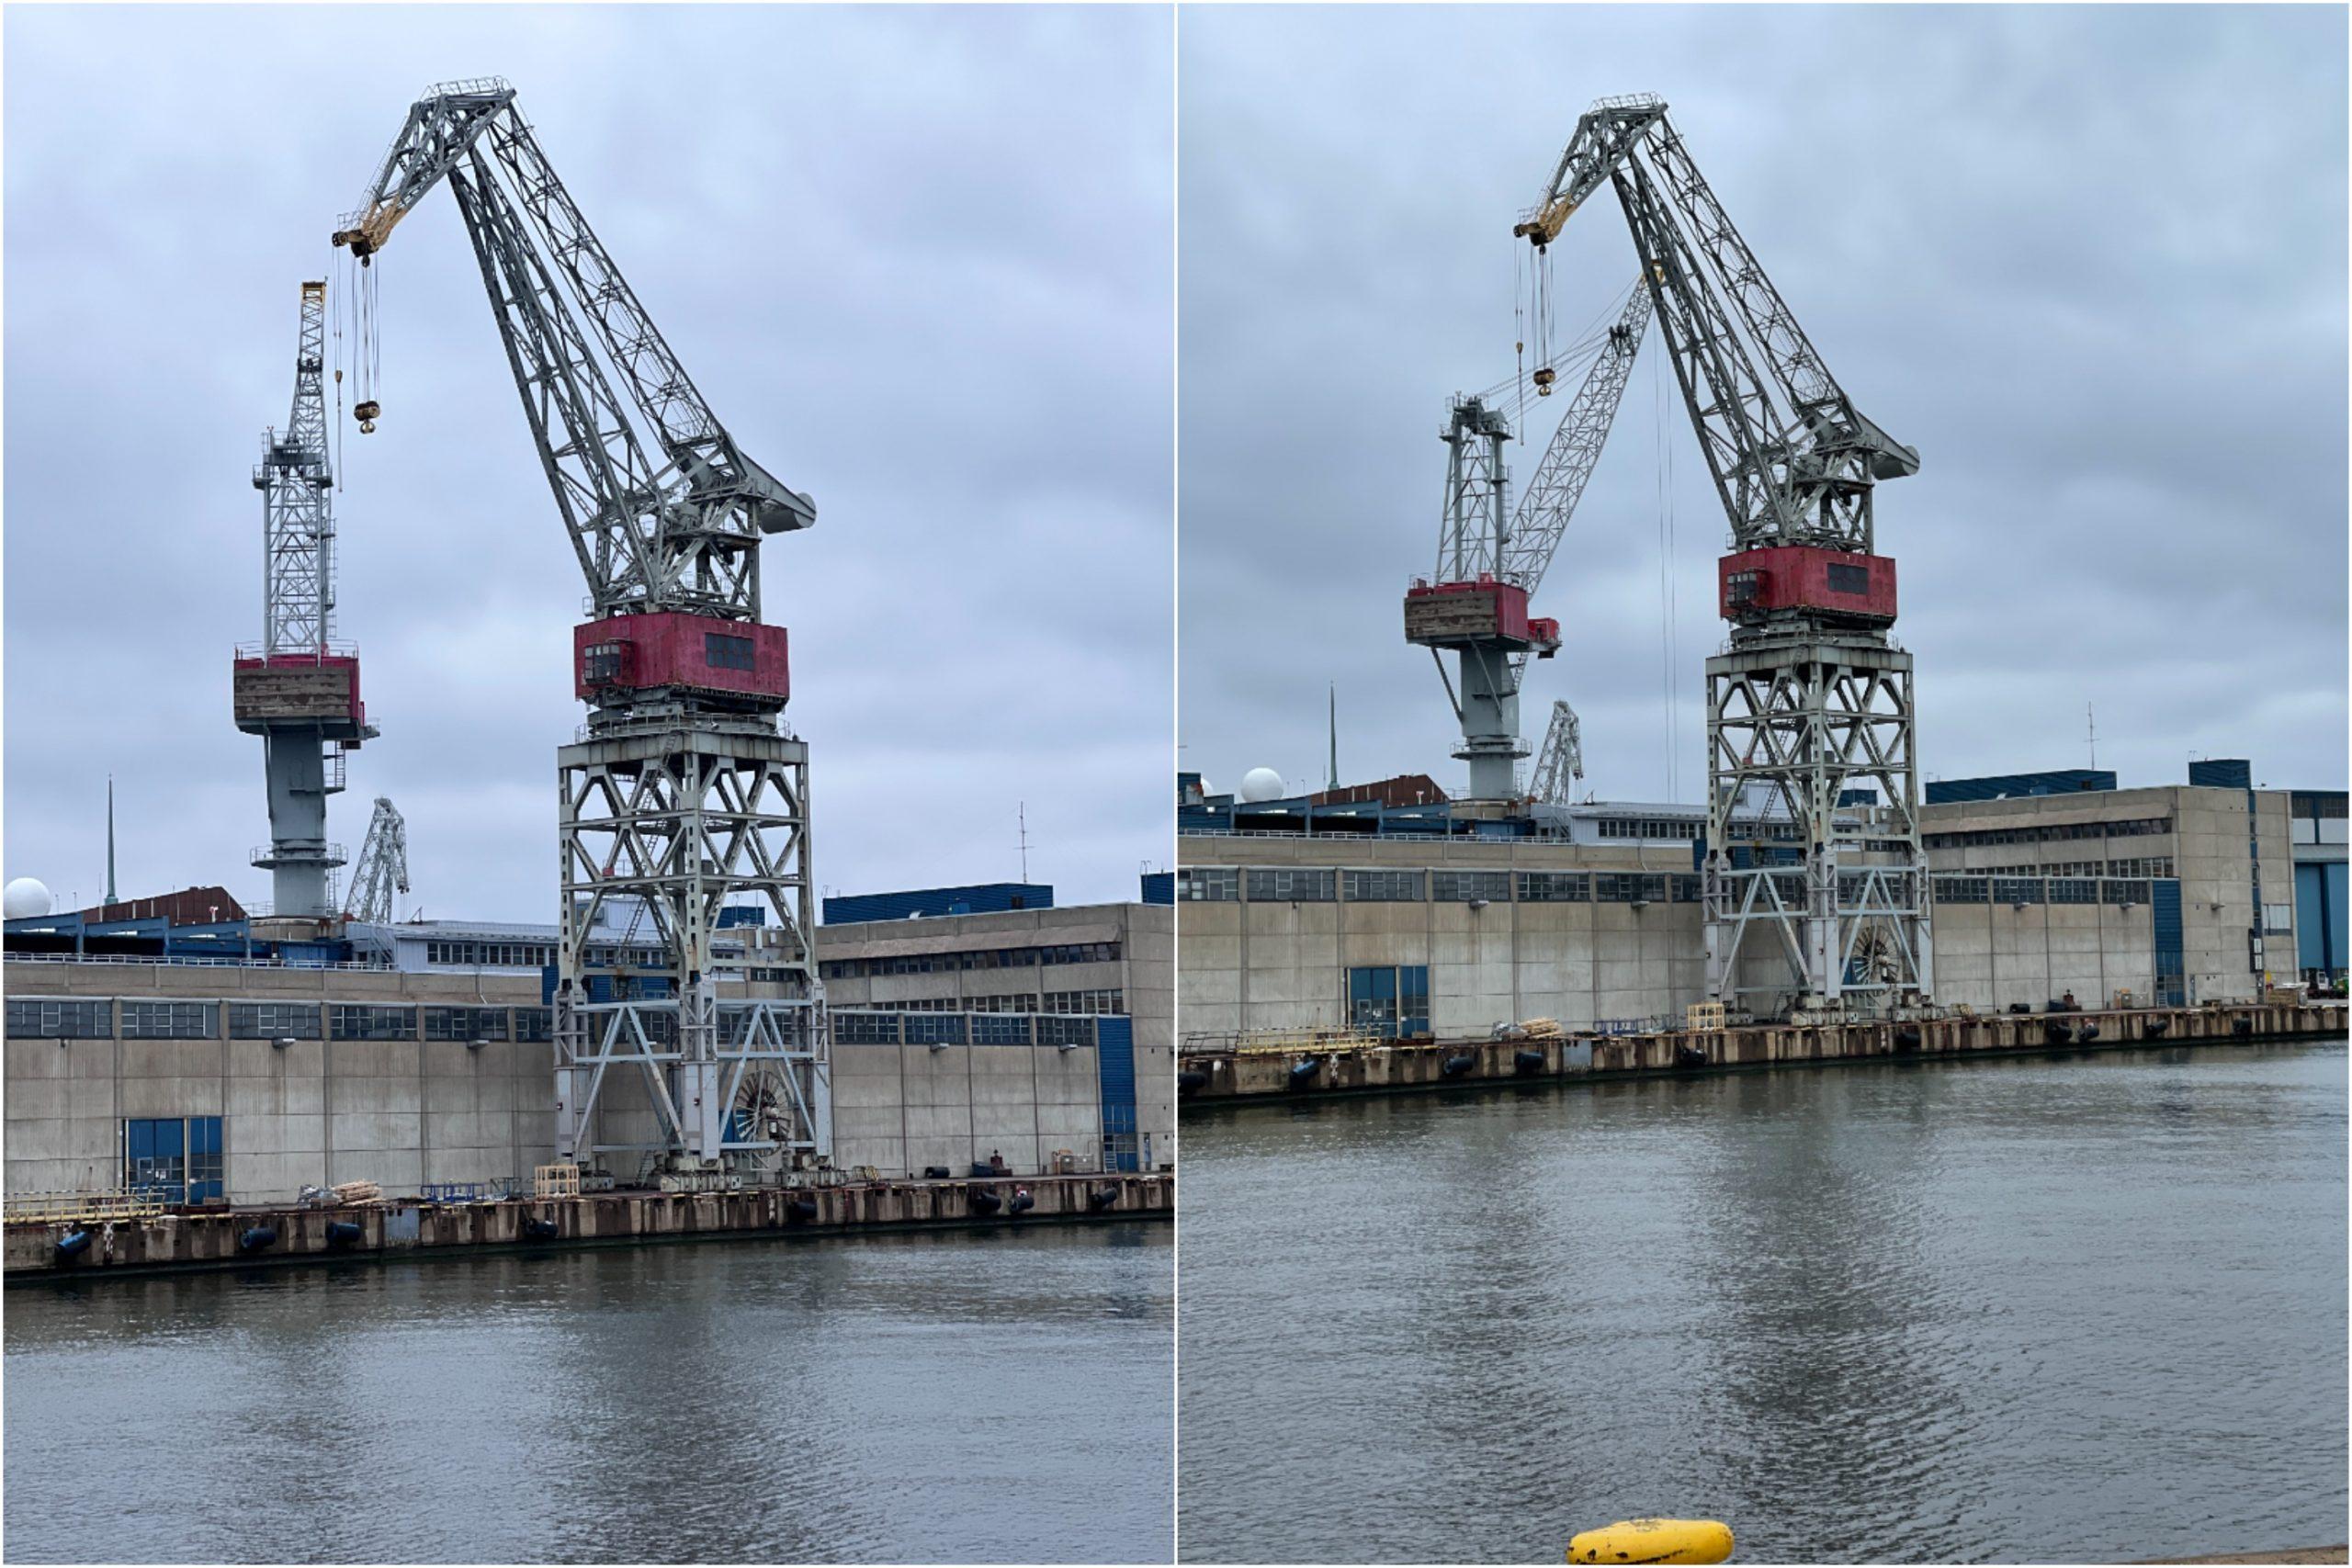 Vasemmalla iPhone 13 Pro ja 3x zoom telekameralla, oikealla iPhone 12 Pro Max ja 2,5 zoom telekameralla.